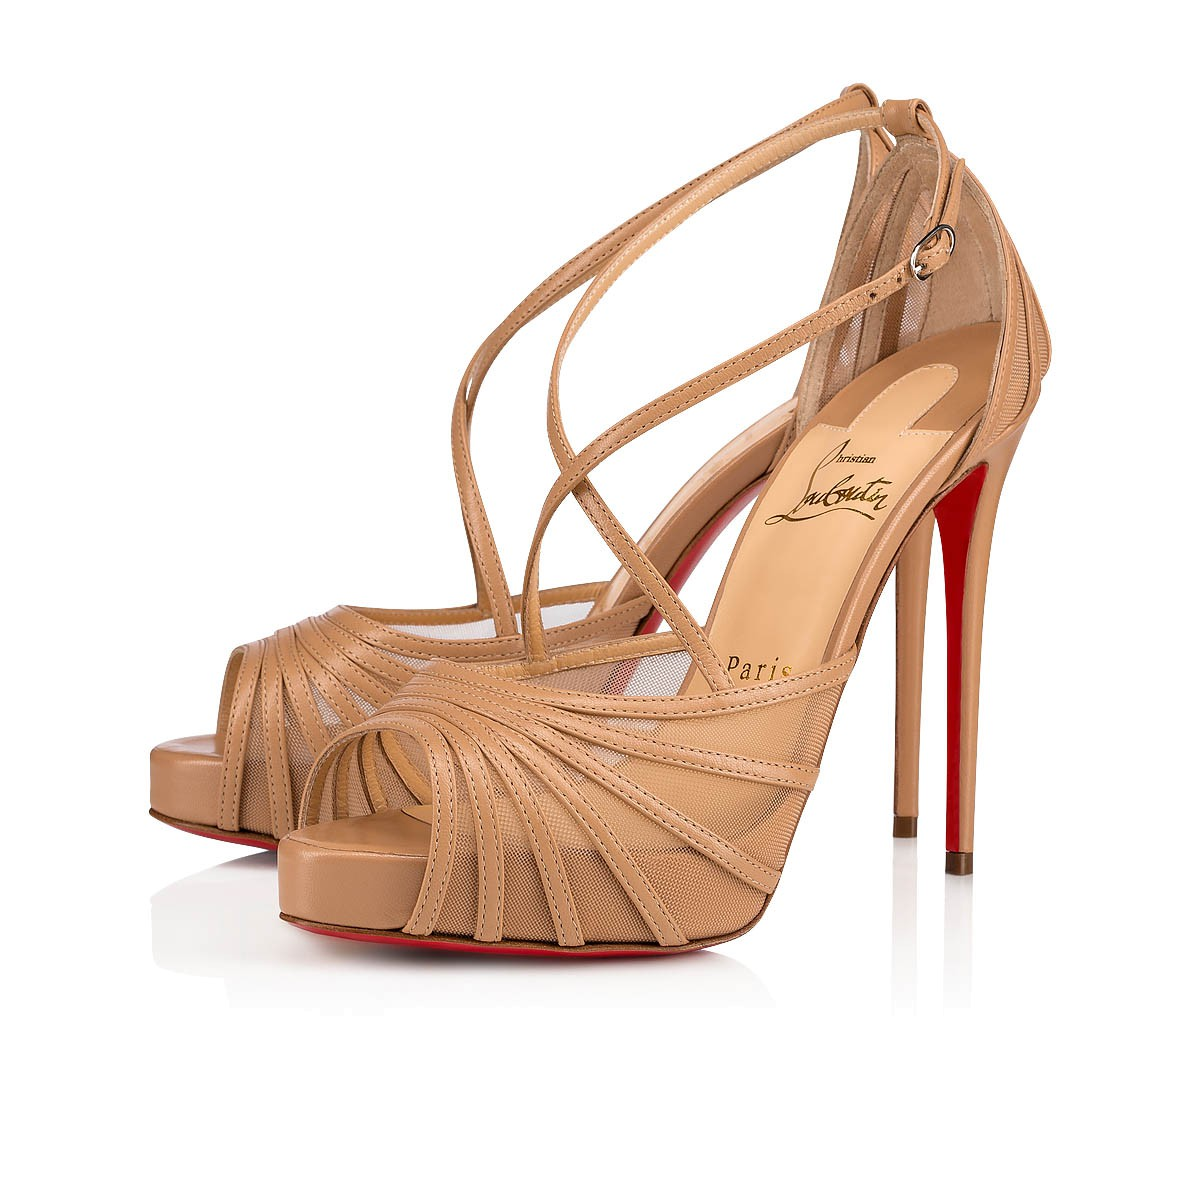 Shoes - Filamenta - Christian Louboutin